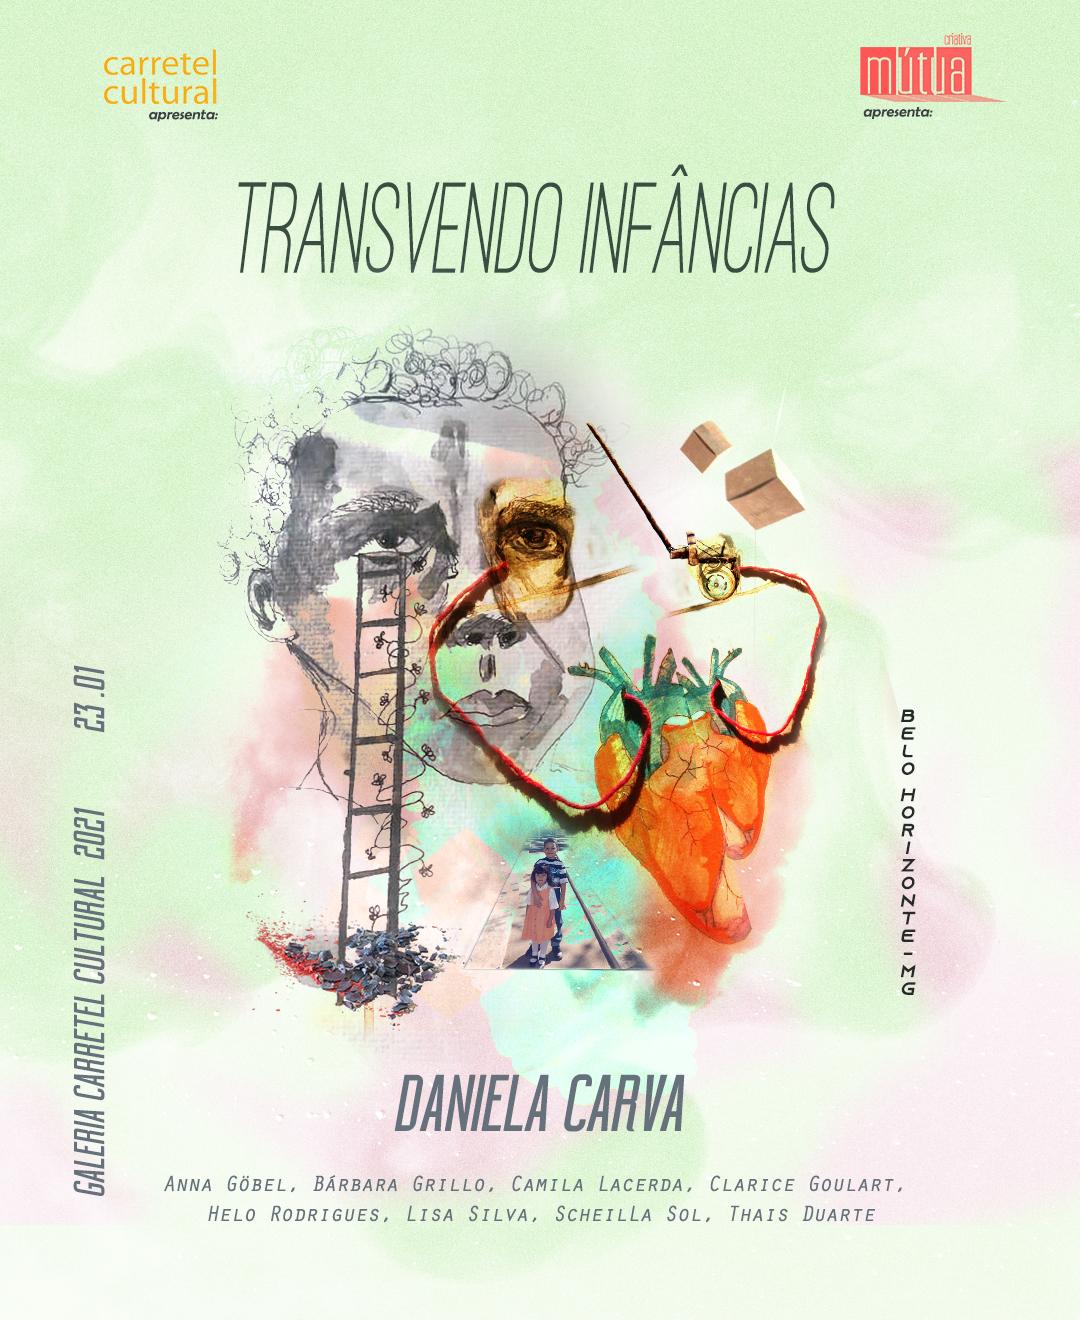 Daniela Carva